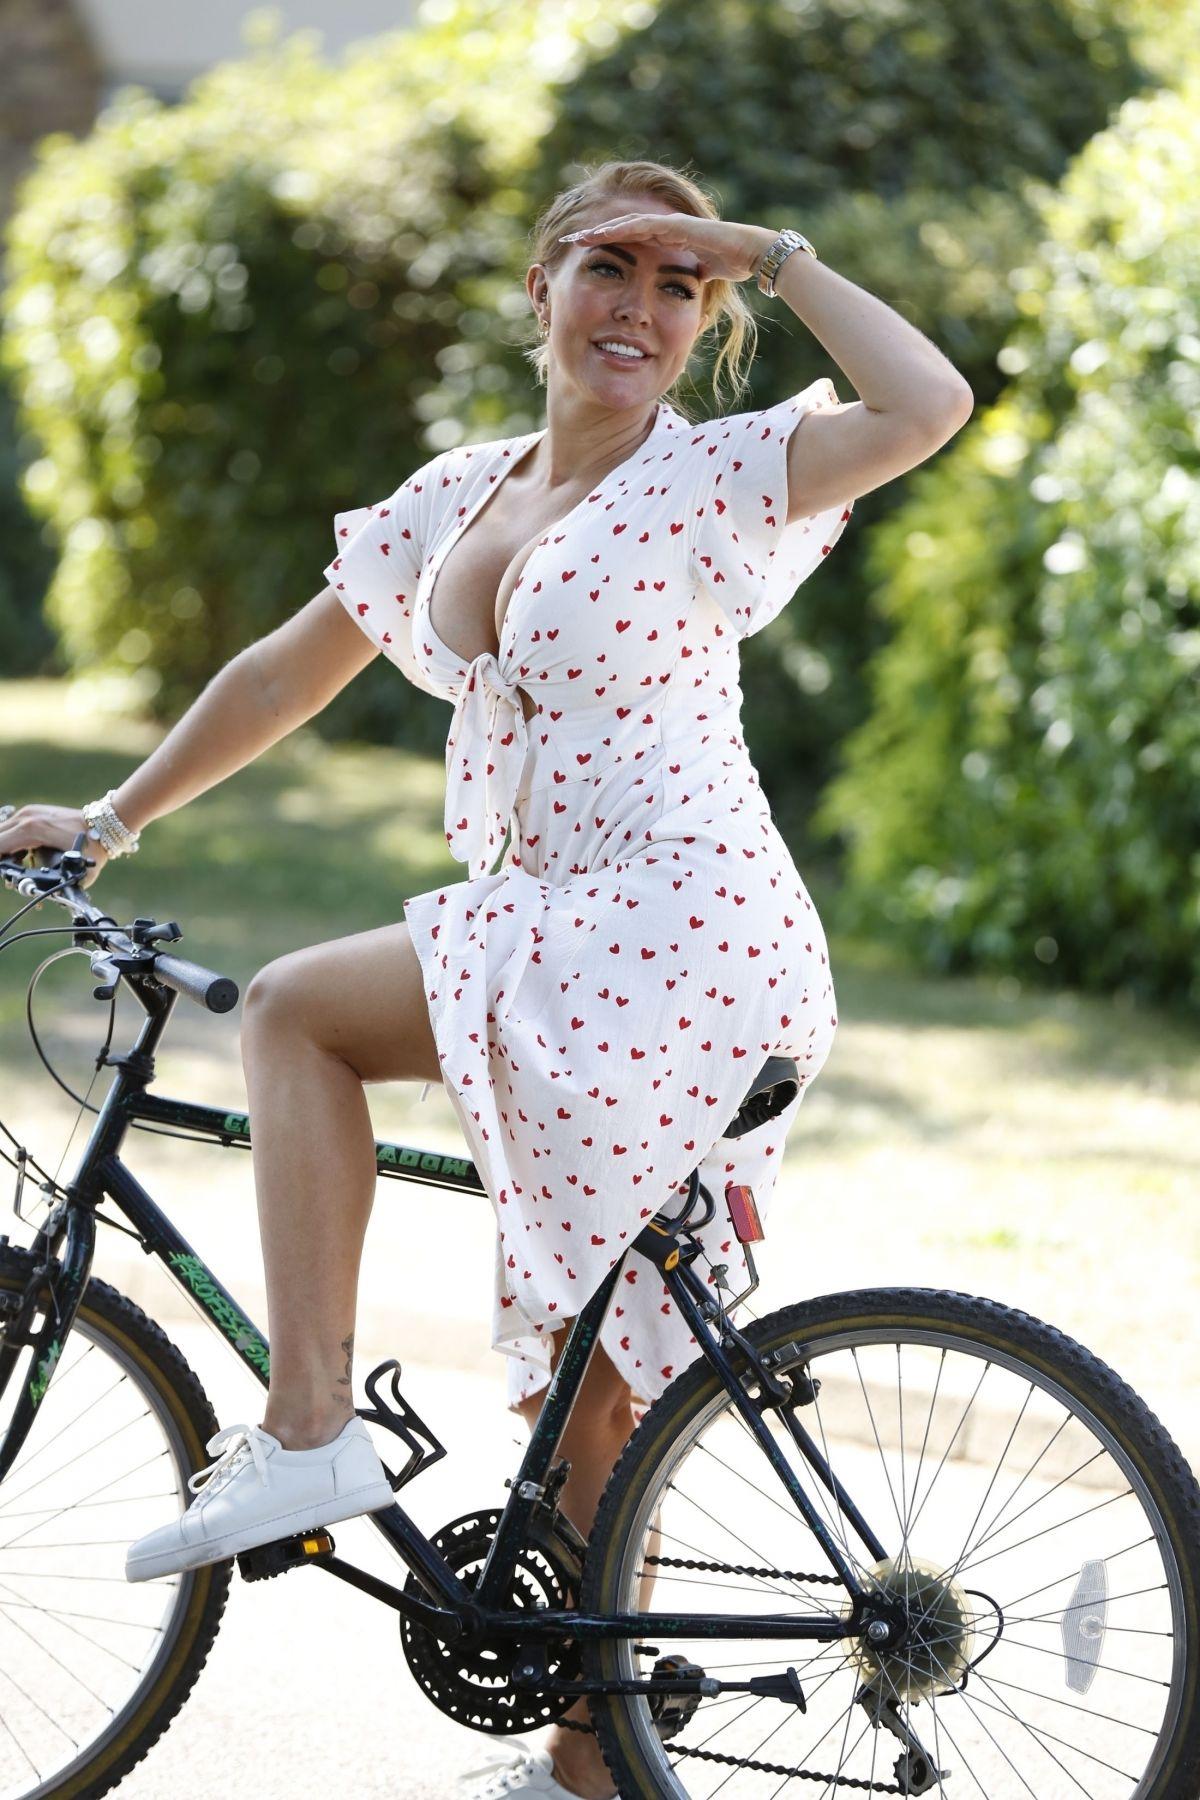 Aisleyne Horgan Wallace Out Riding Bike London